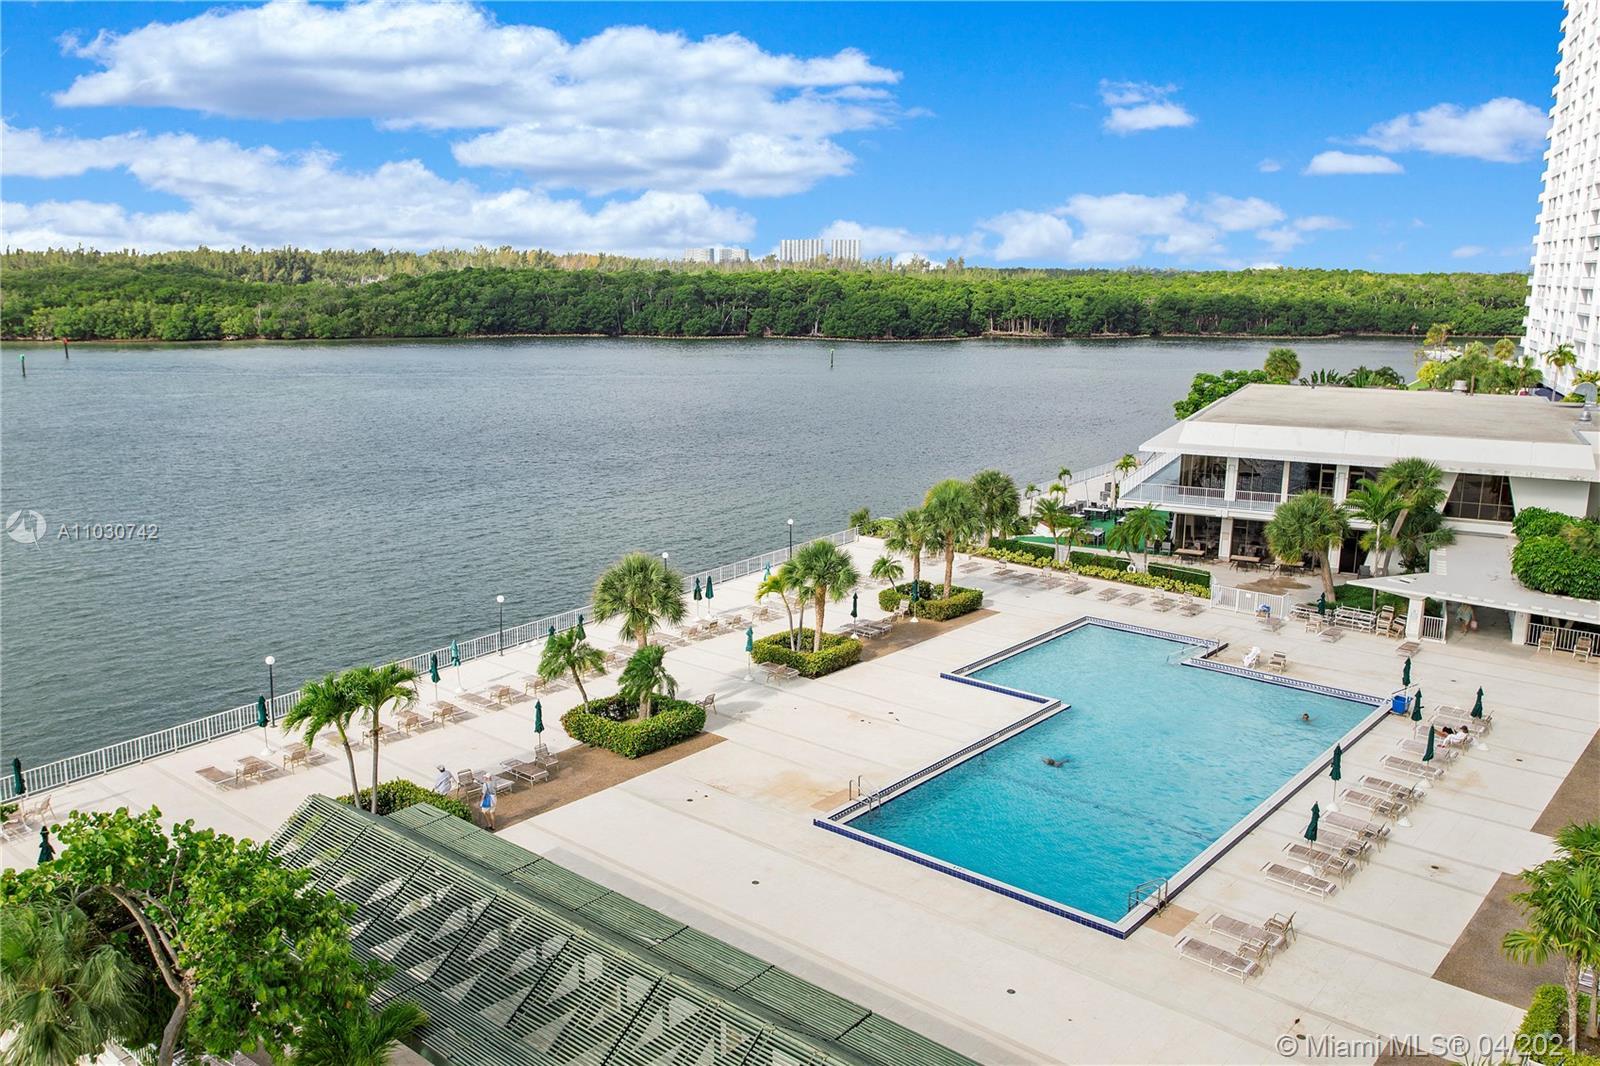 Arlen House #404 - 300 Bayview Dr #404, Sunny Isles Beach, FL 33160